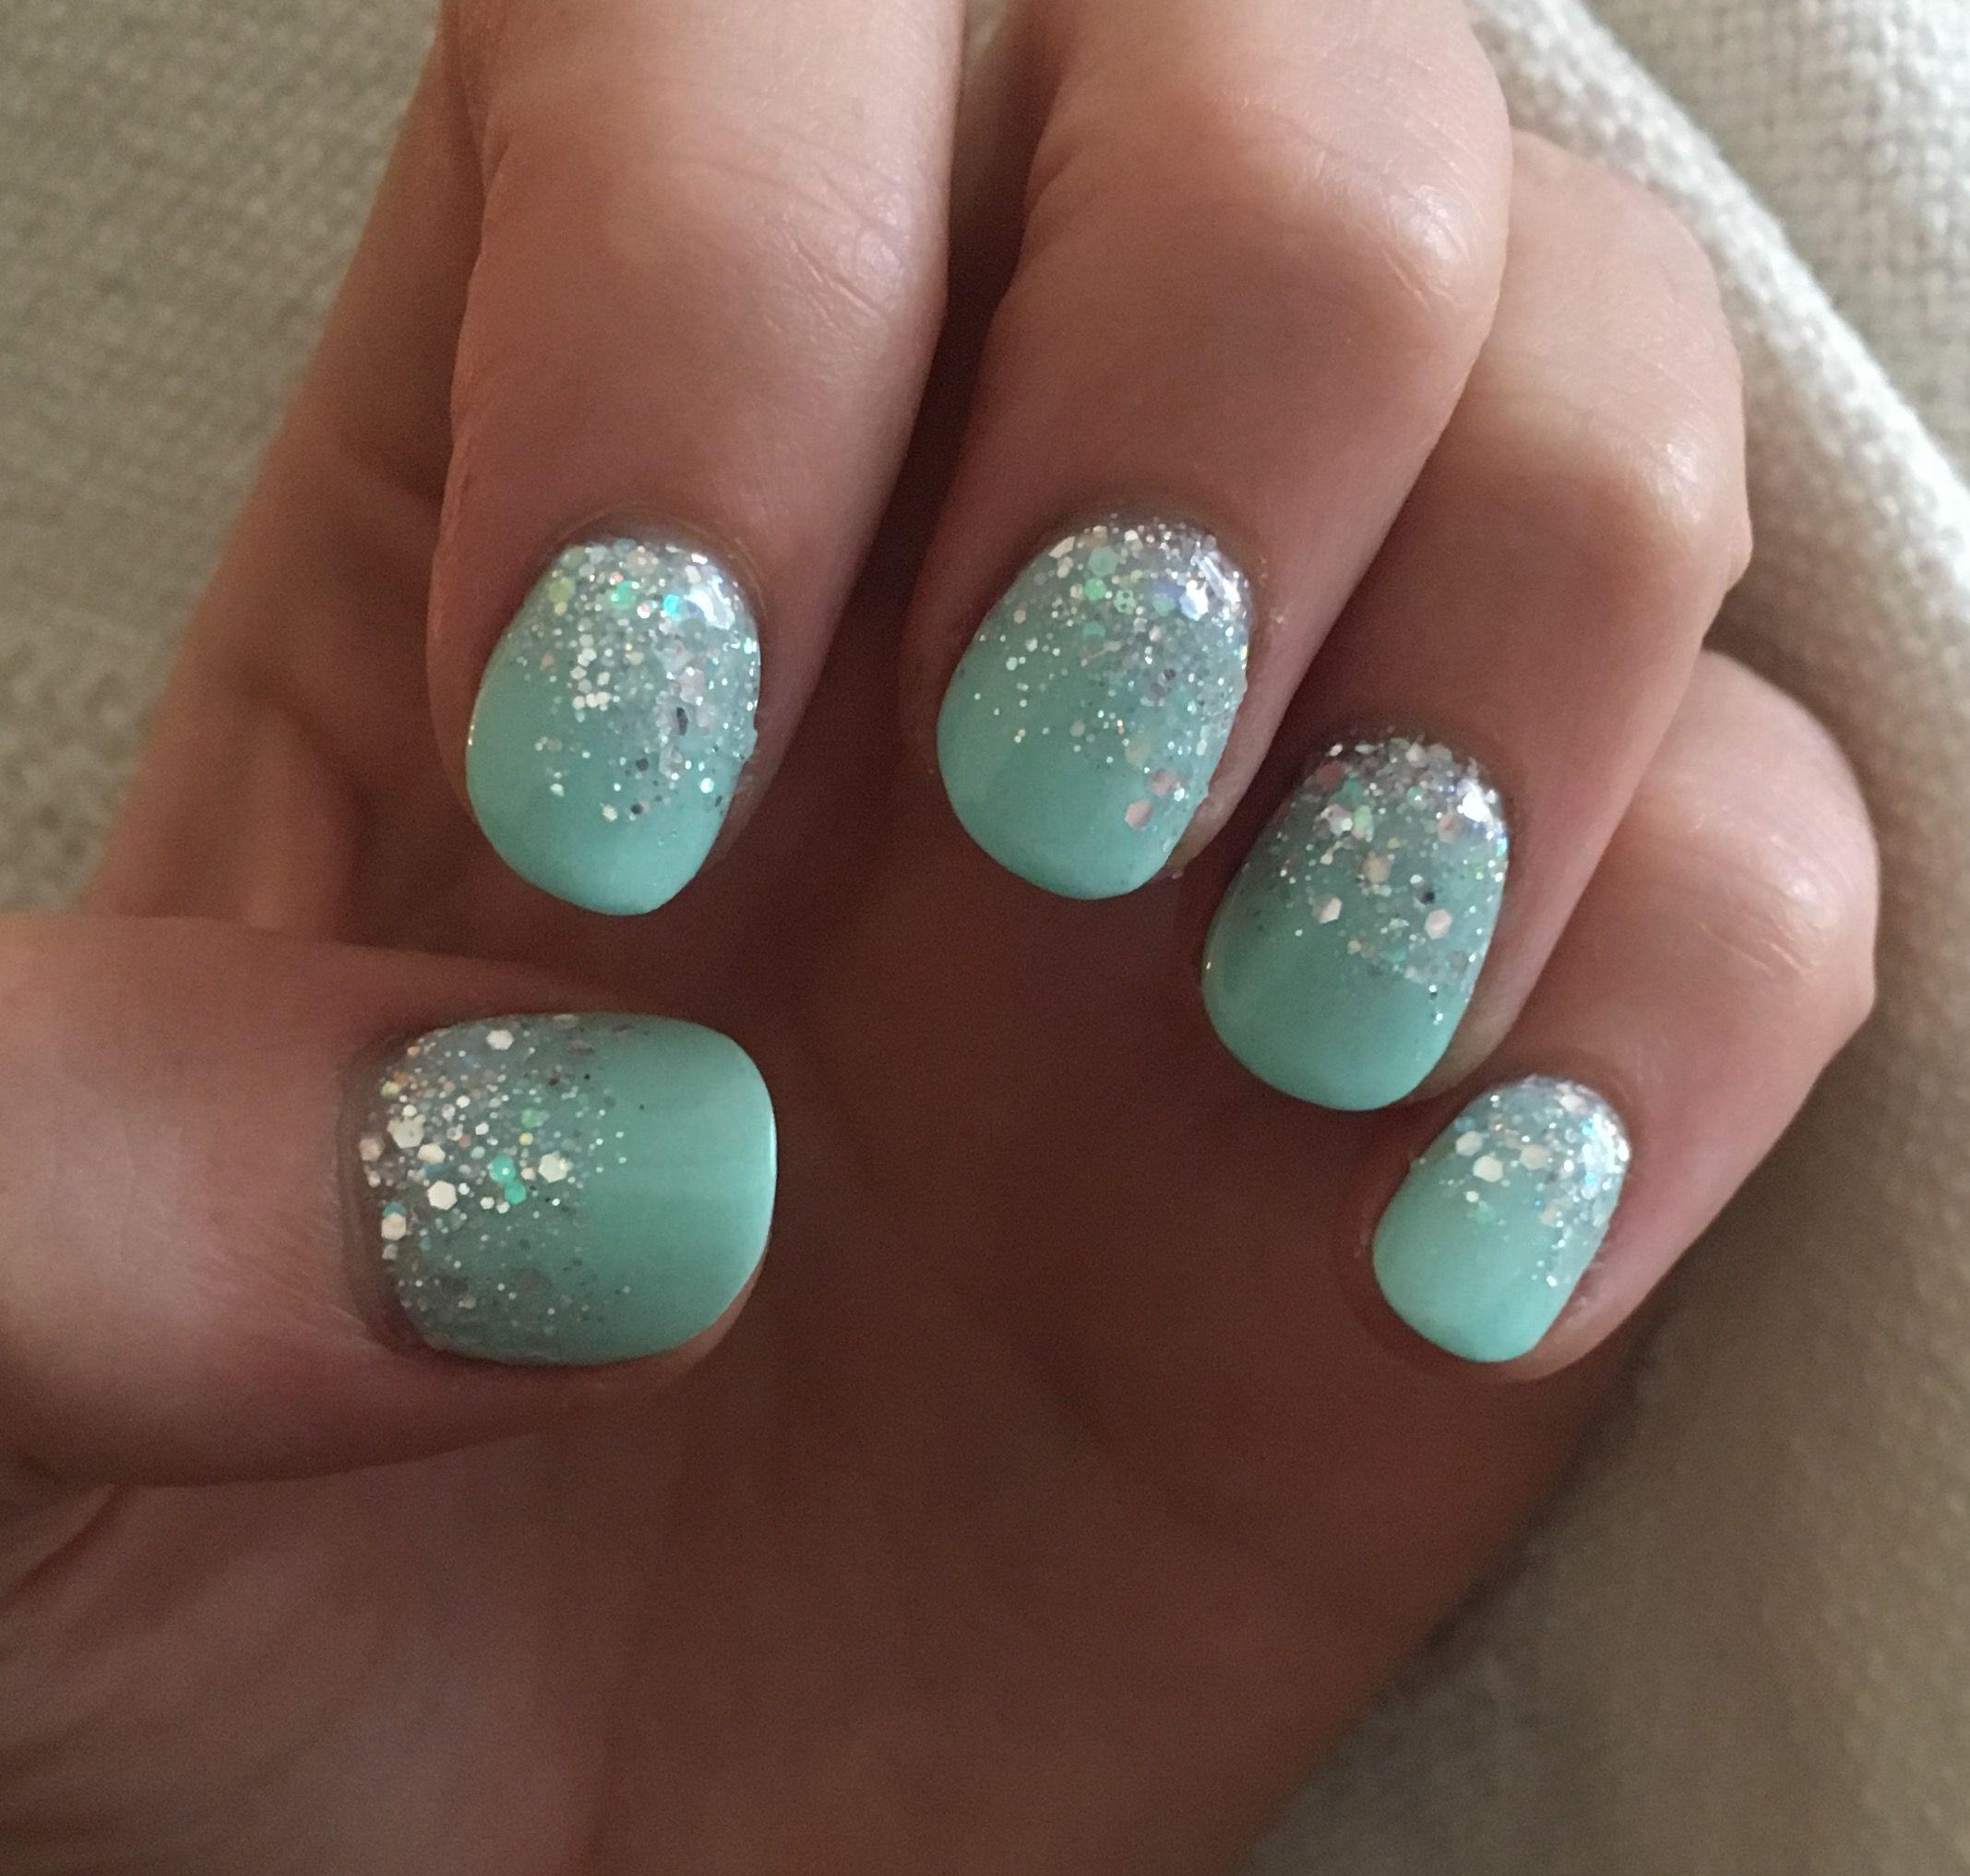 Nexgen silver ombré dip acrylic nails   Nailed it!   Pinterest